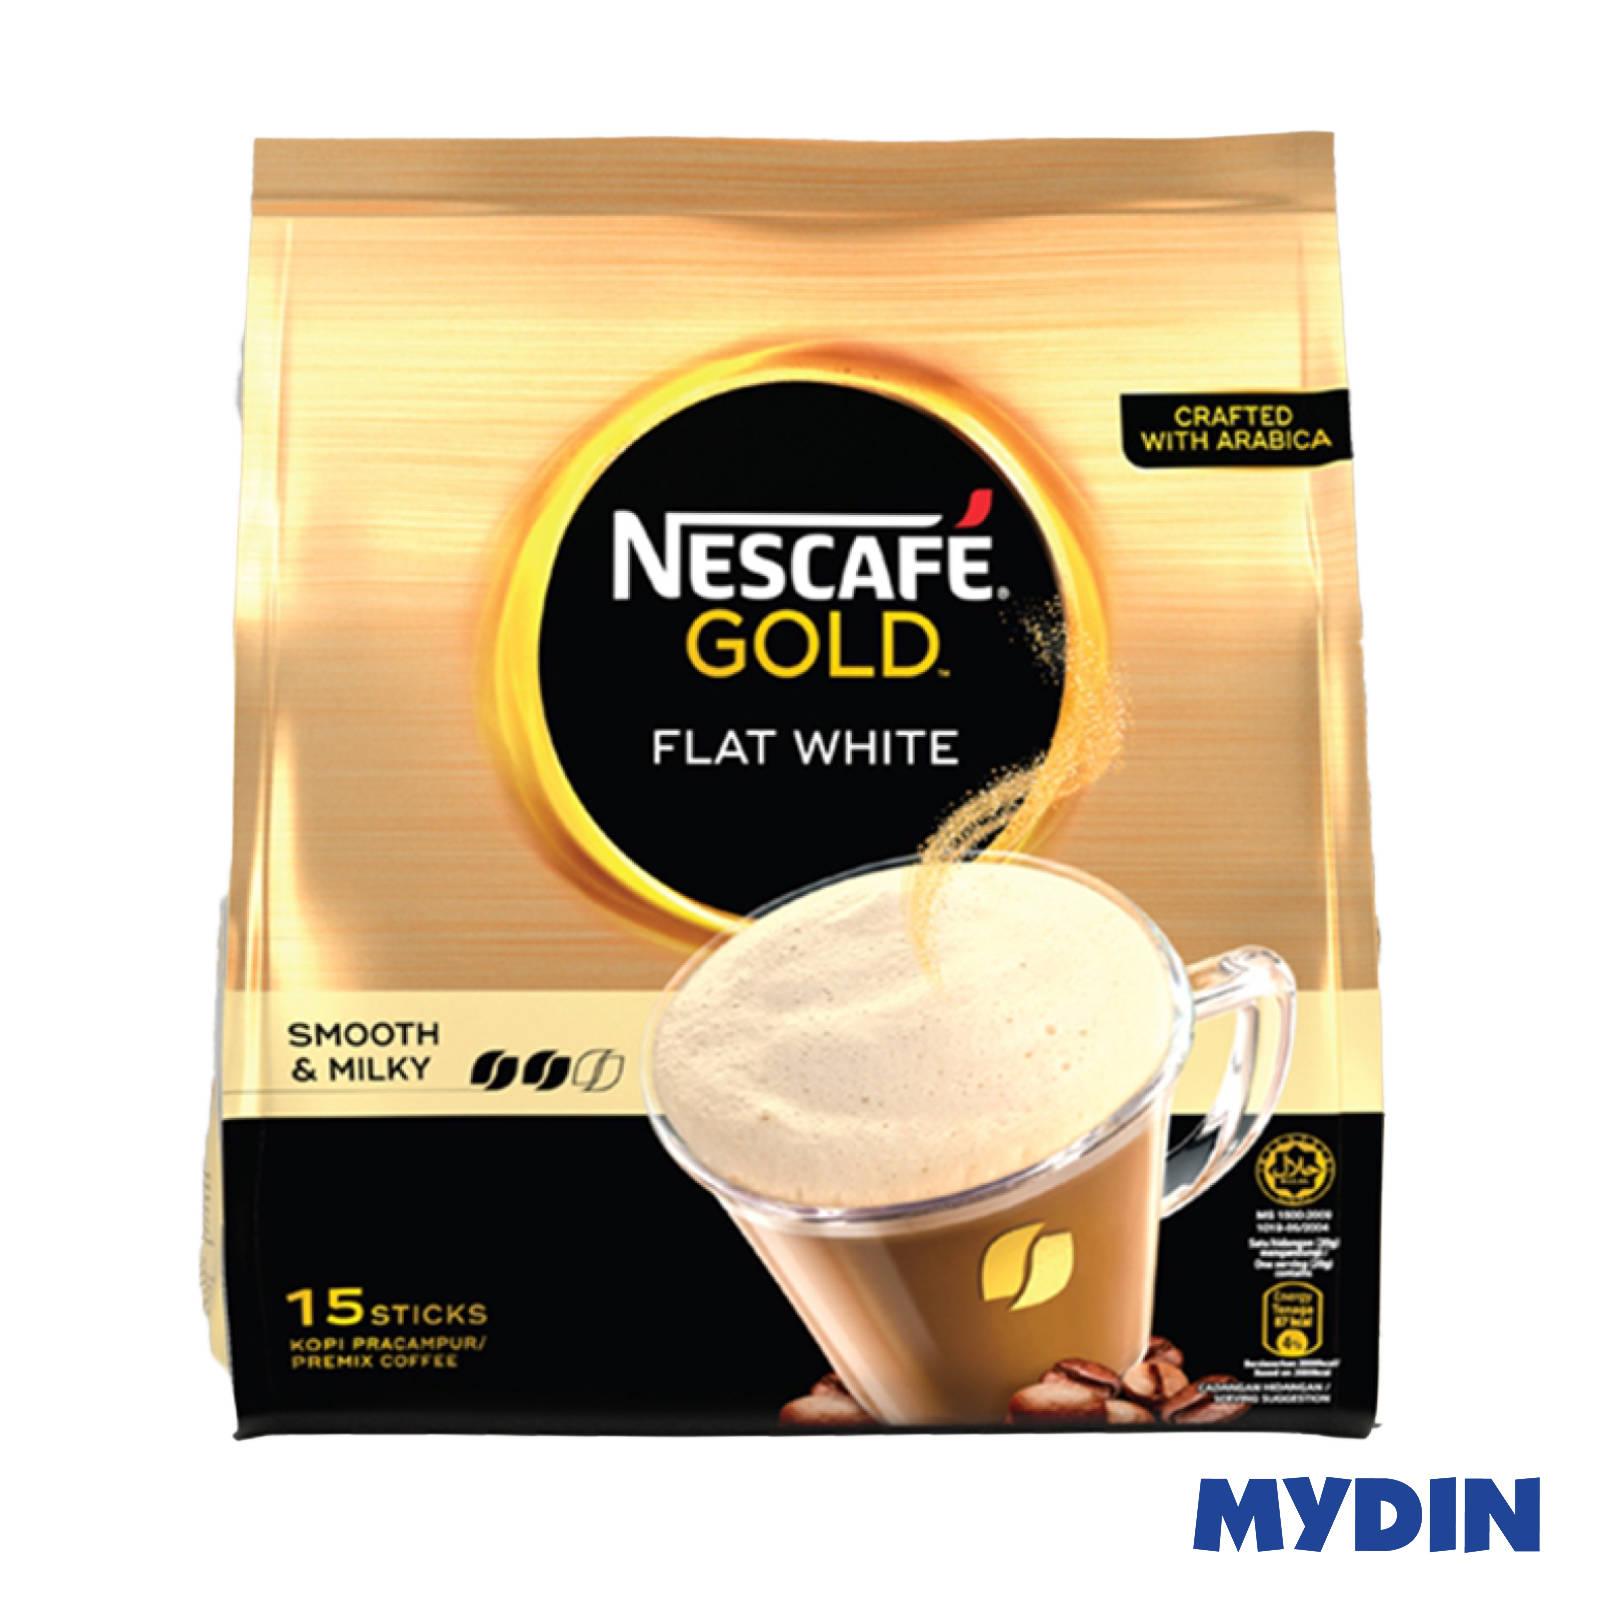 Nescafe Gold Flat White (15 x 20g)